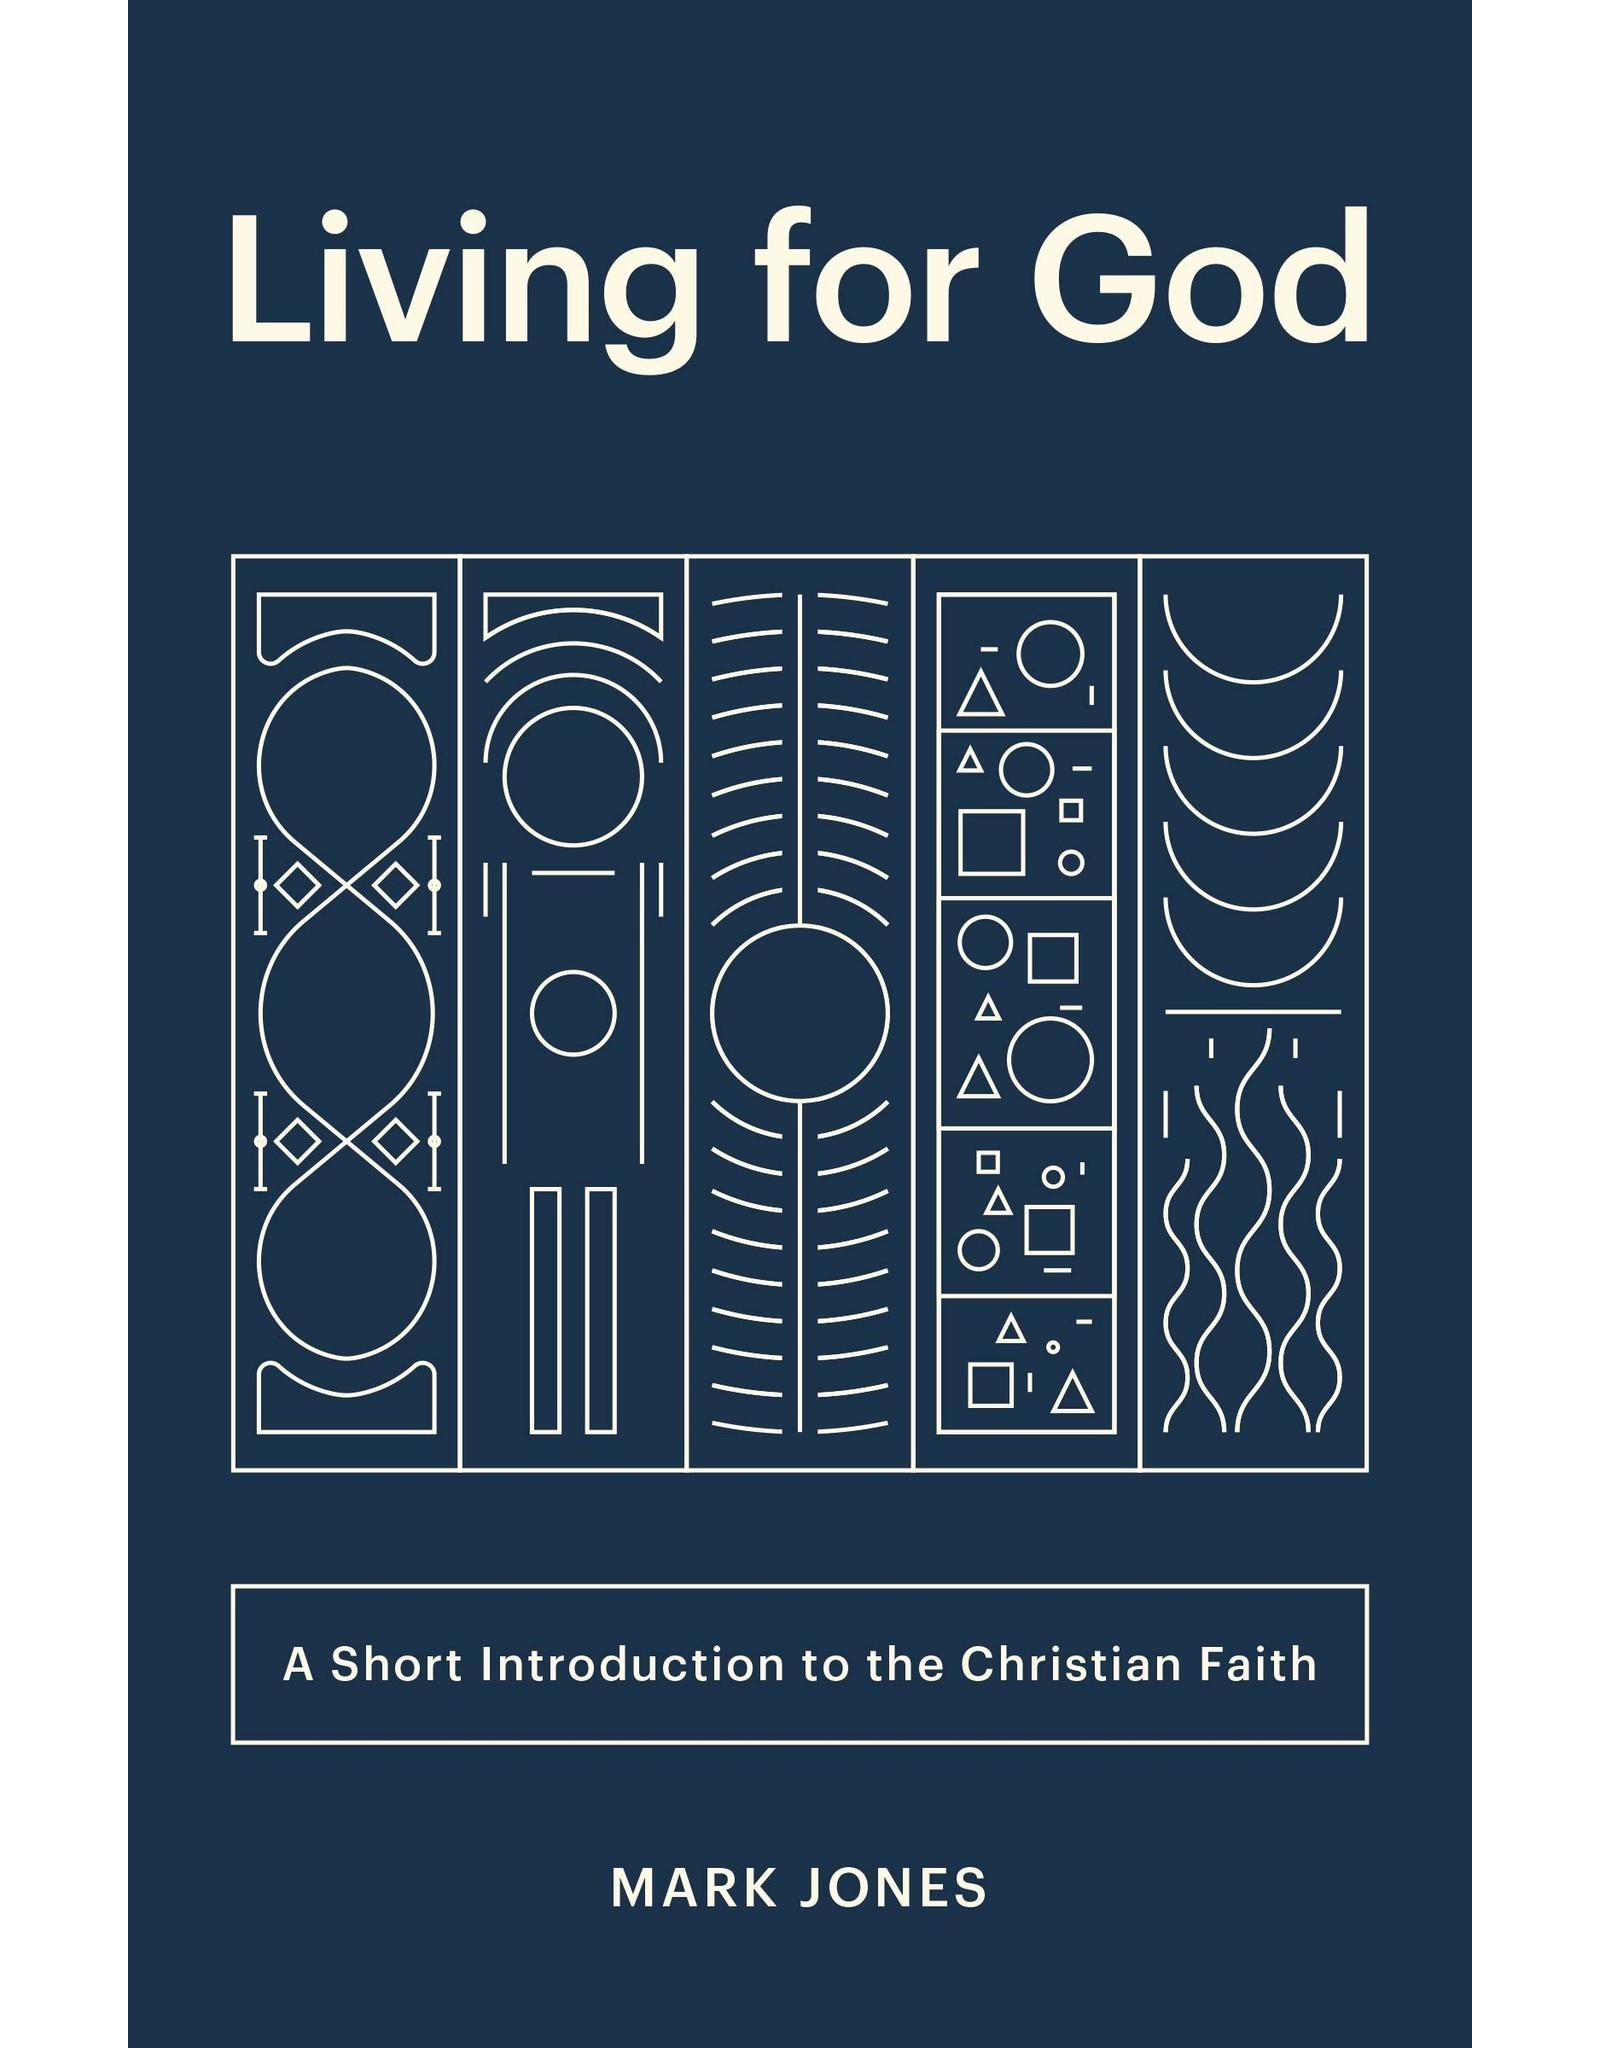 Crossway / Good News Living for God: A Short Introduction to the Christian Faith